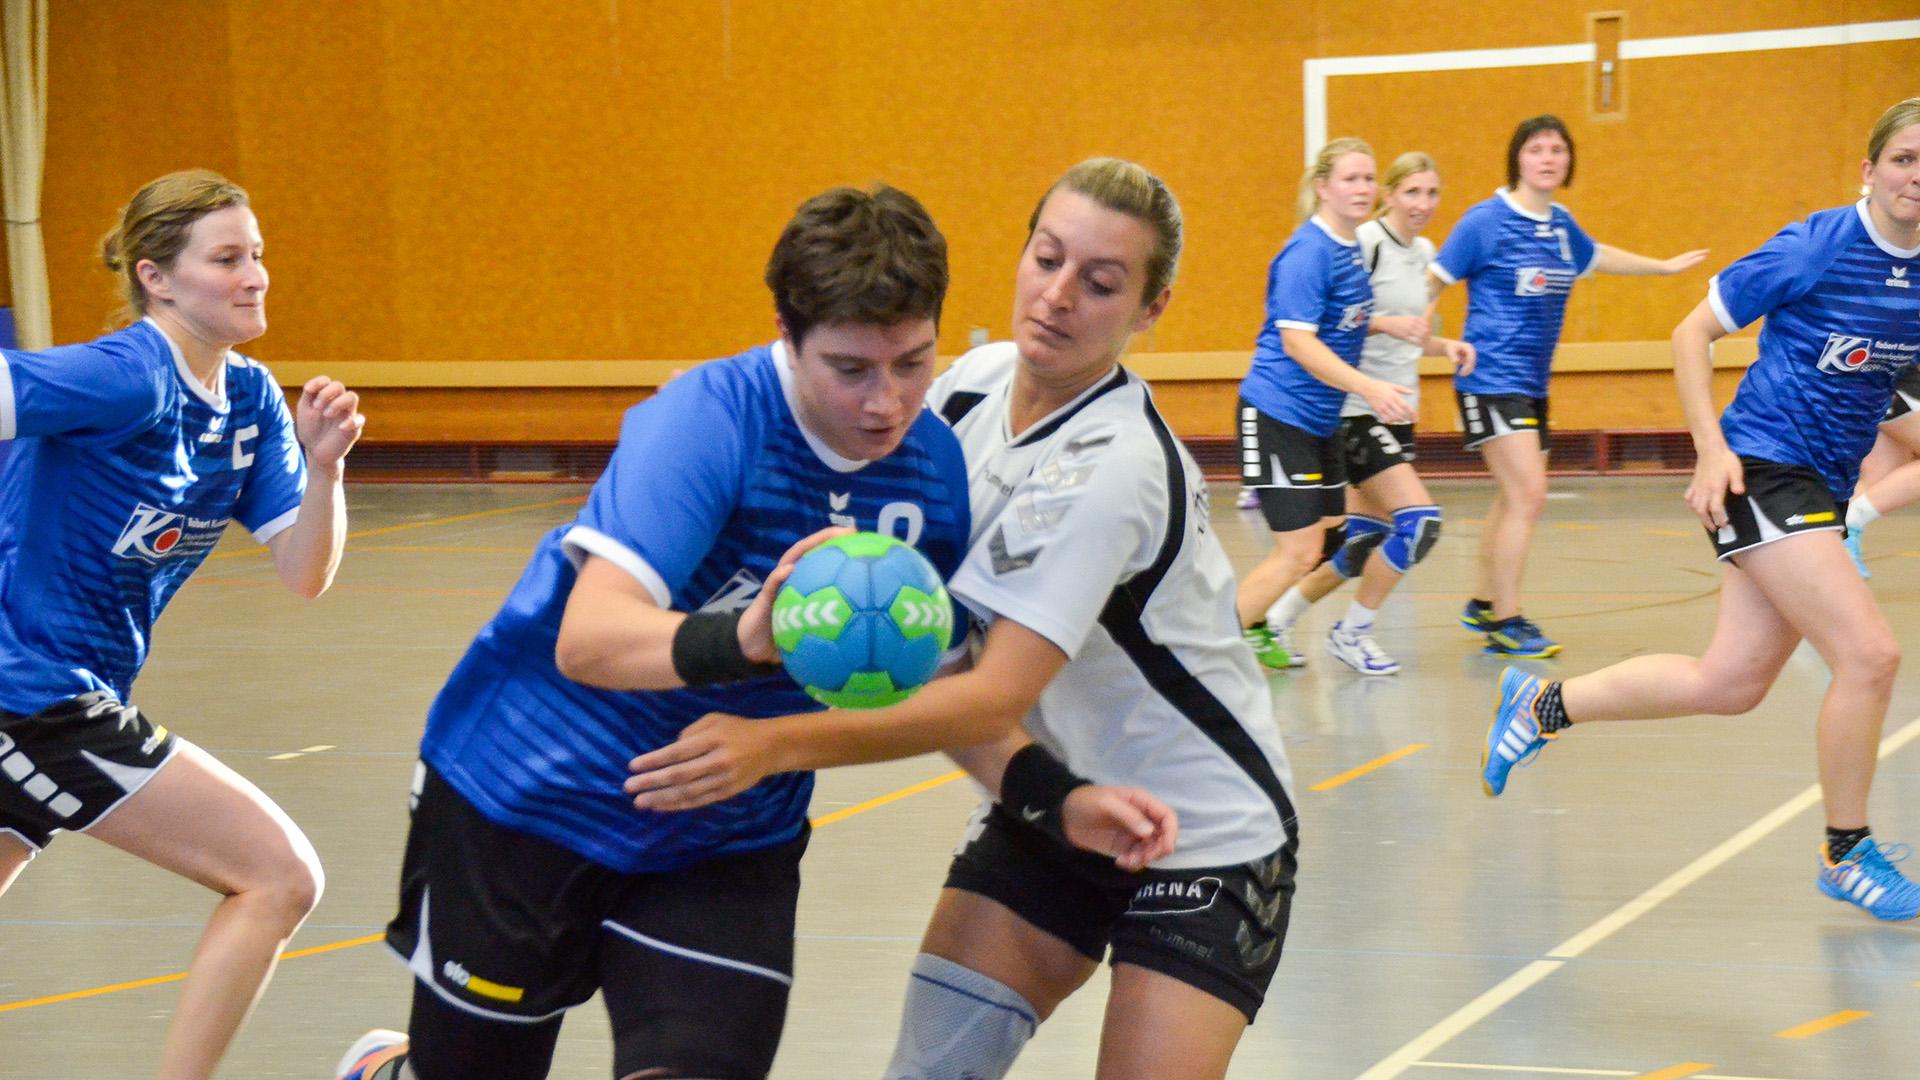 041Slider_F30_tsg_leutkirch_handball